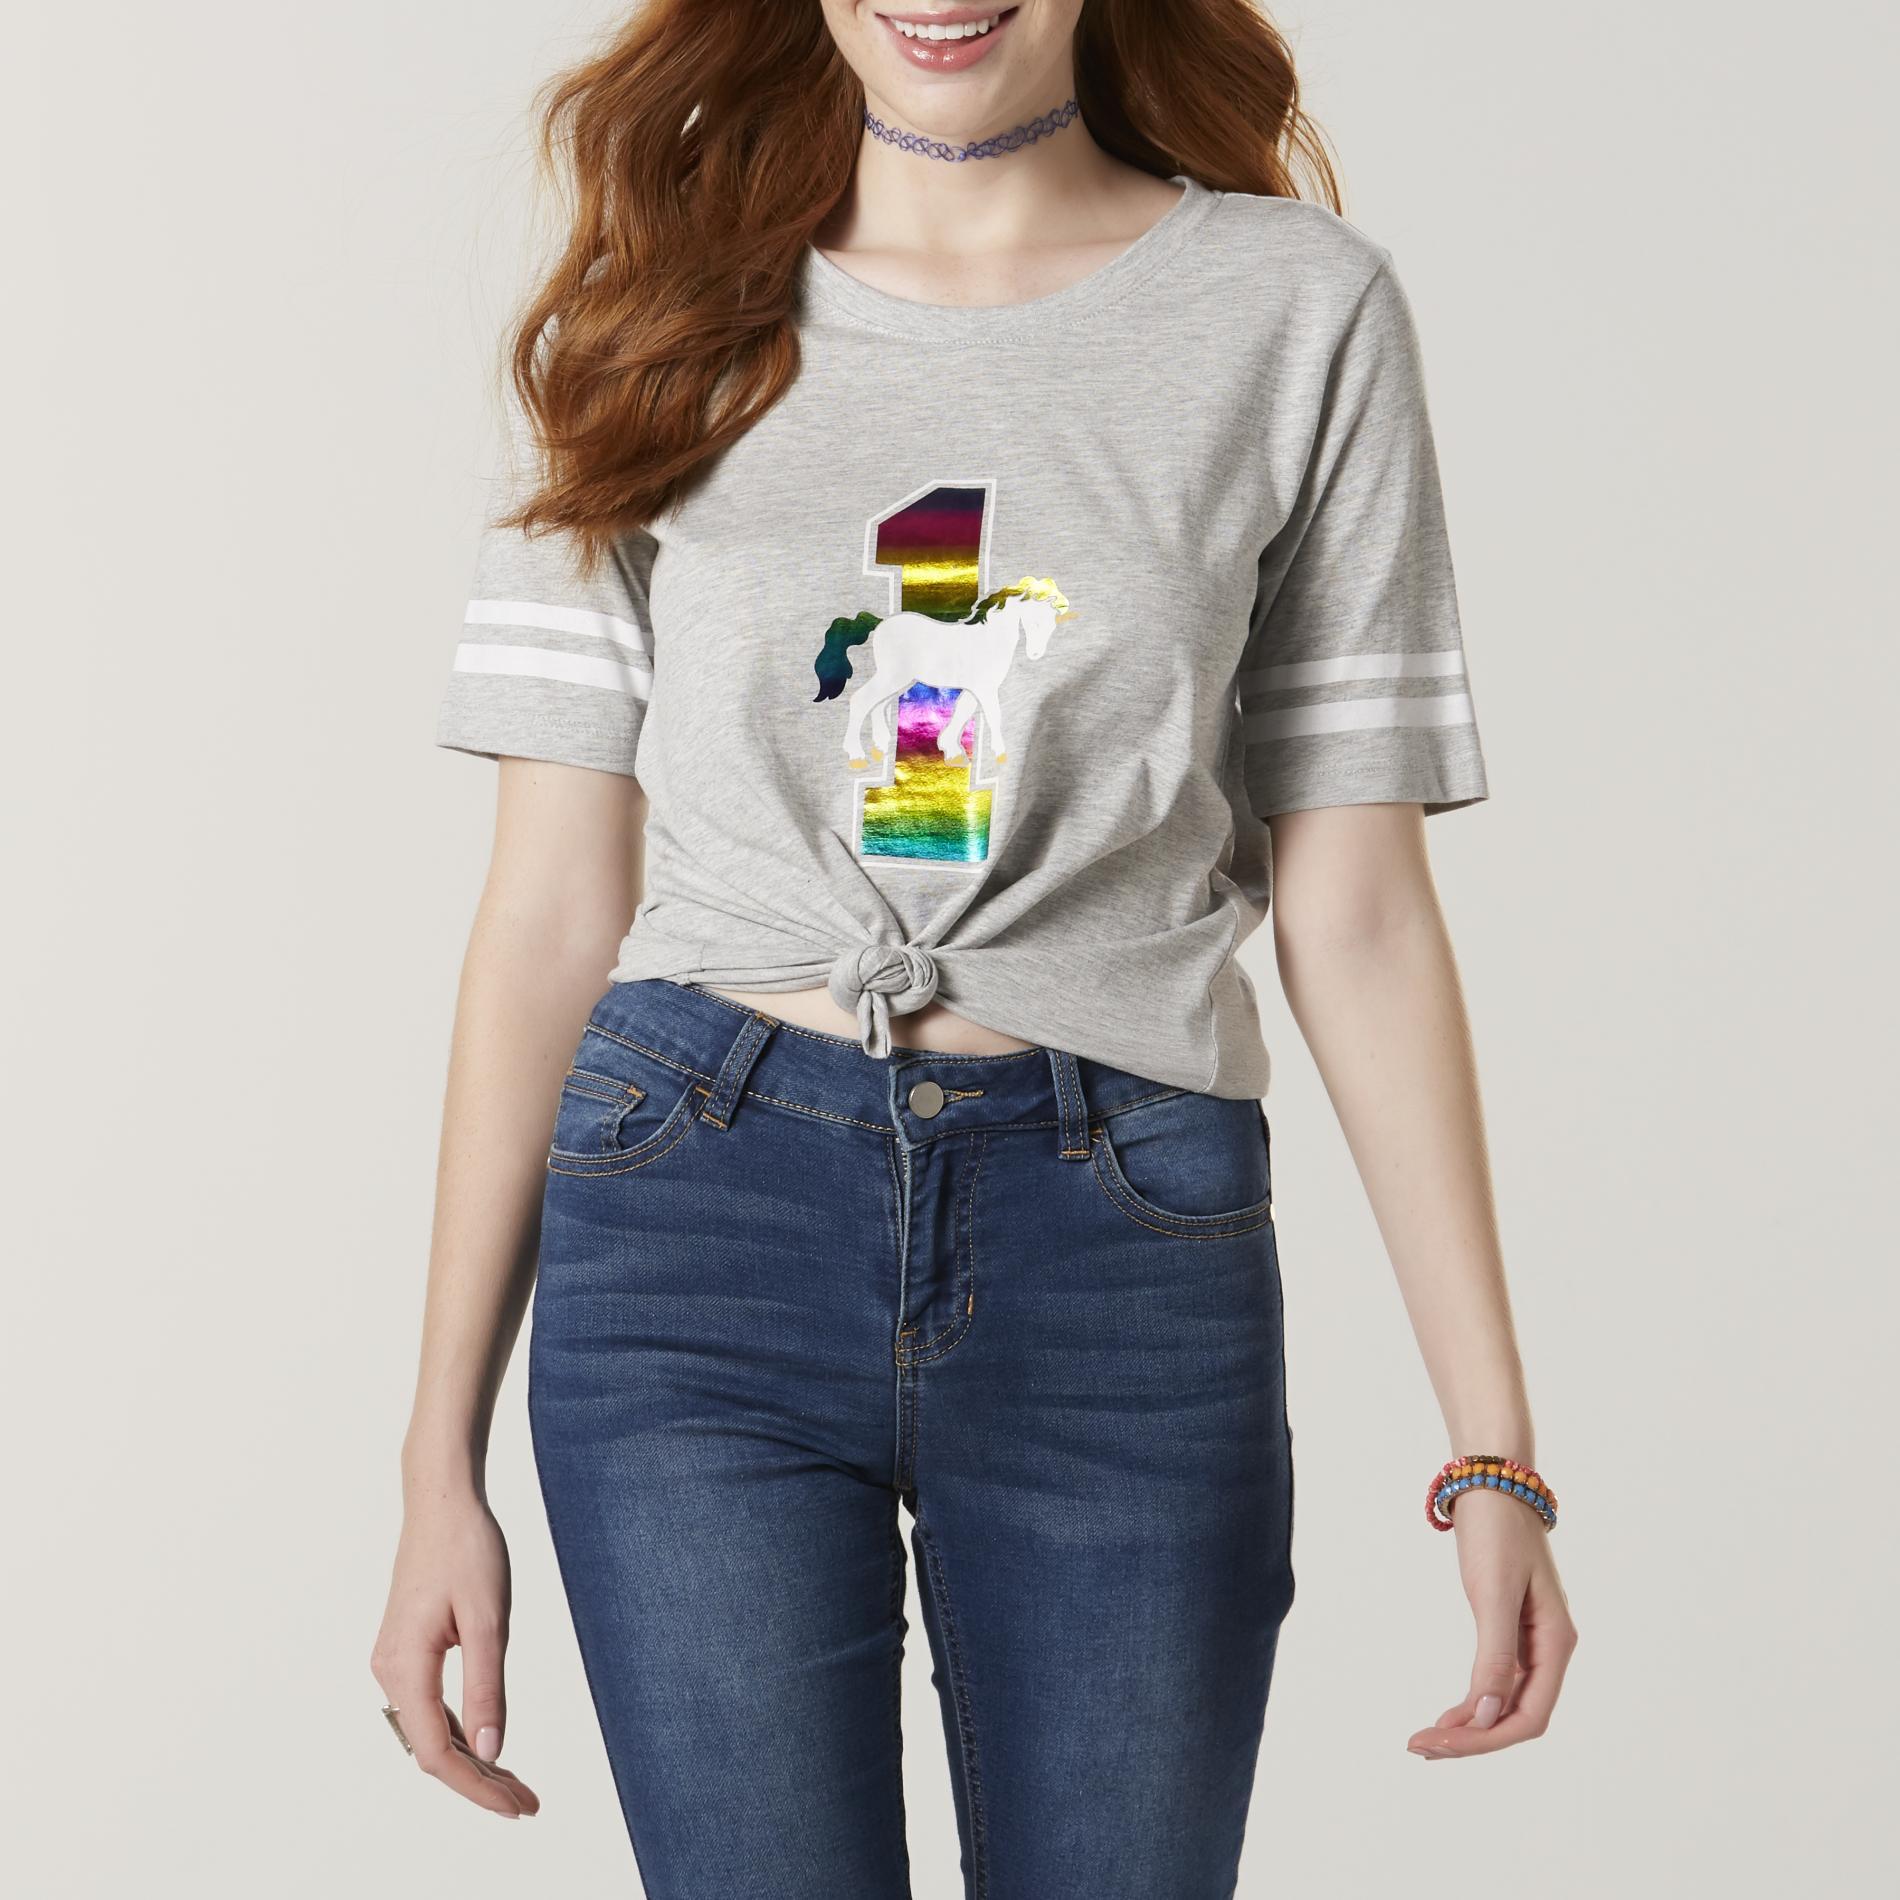 Joe Boxer Juniors' Graphic T-Shirt - Unicorn, Size: Small, Grey